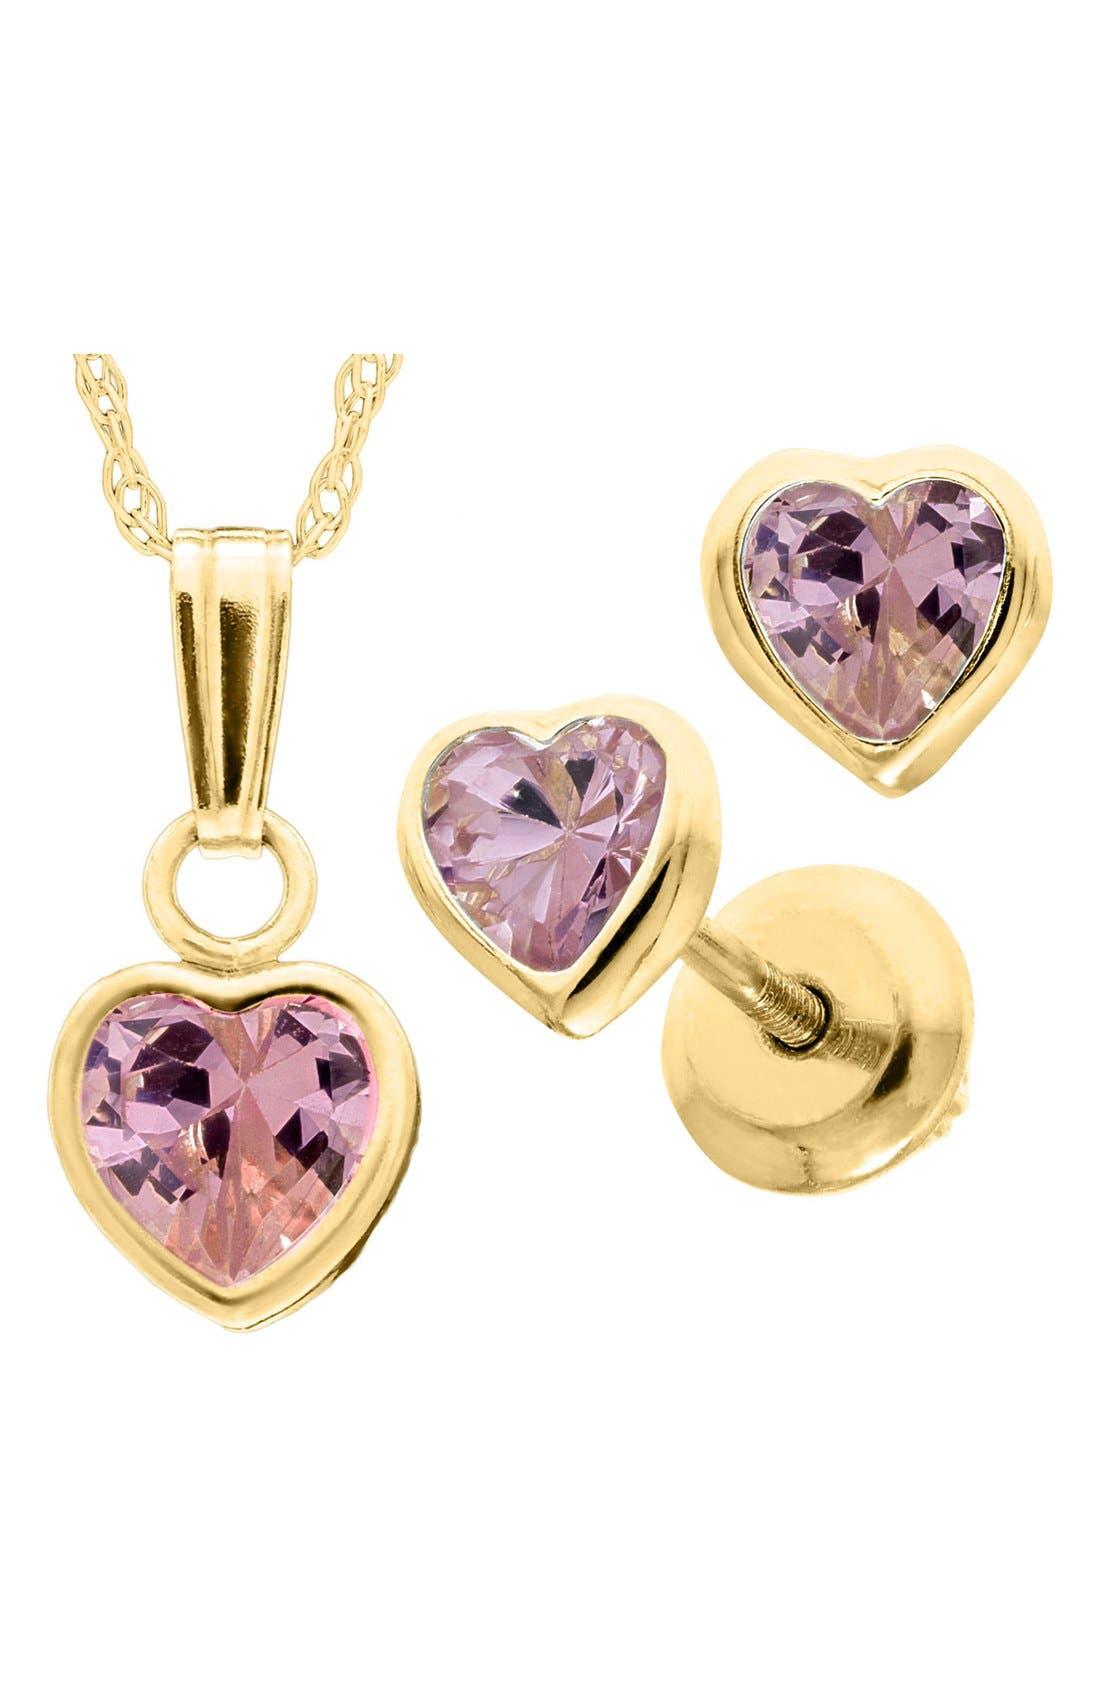 14k Gold Birthstone Necklace & Stud Earrings,                             Alternate thumbnail 2, color,                             October